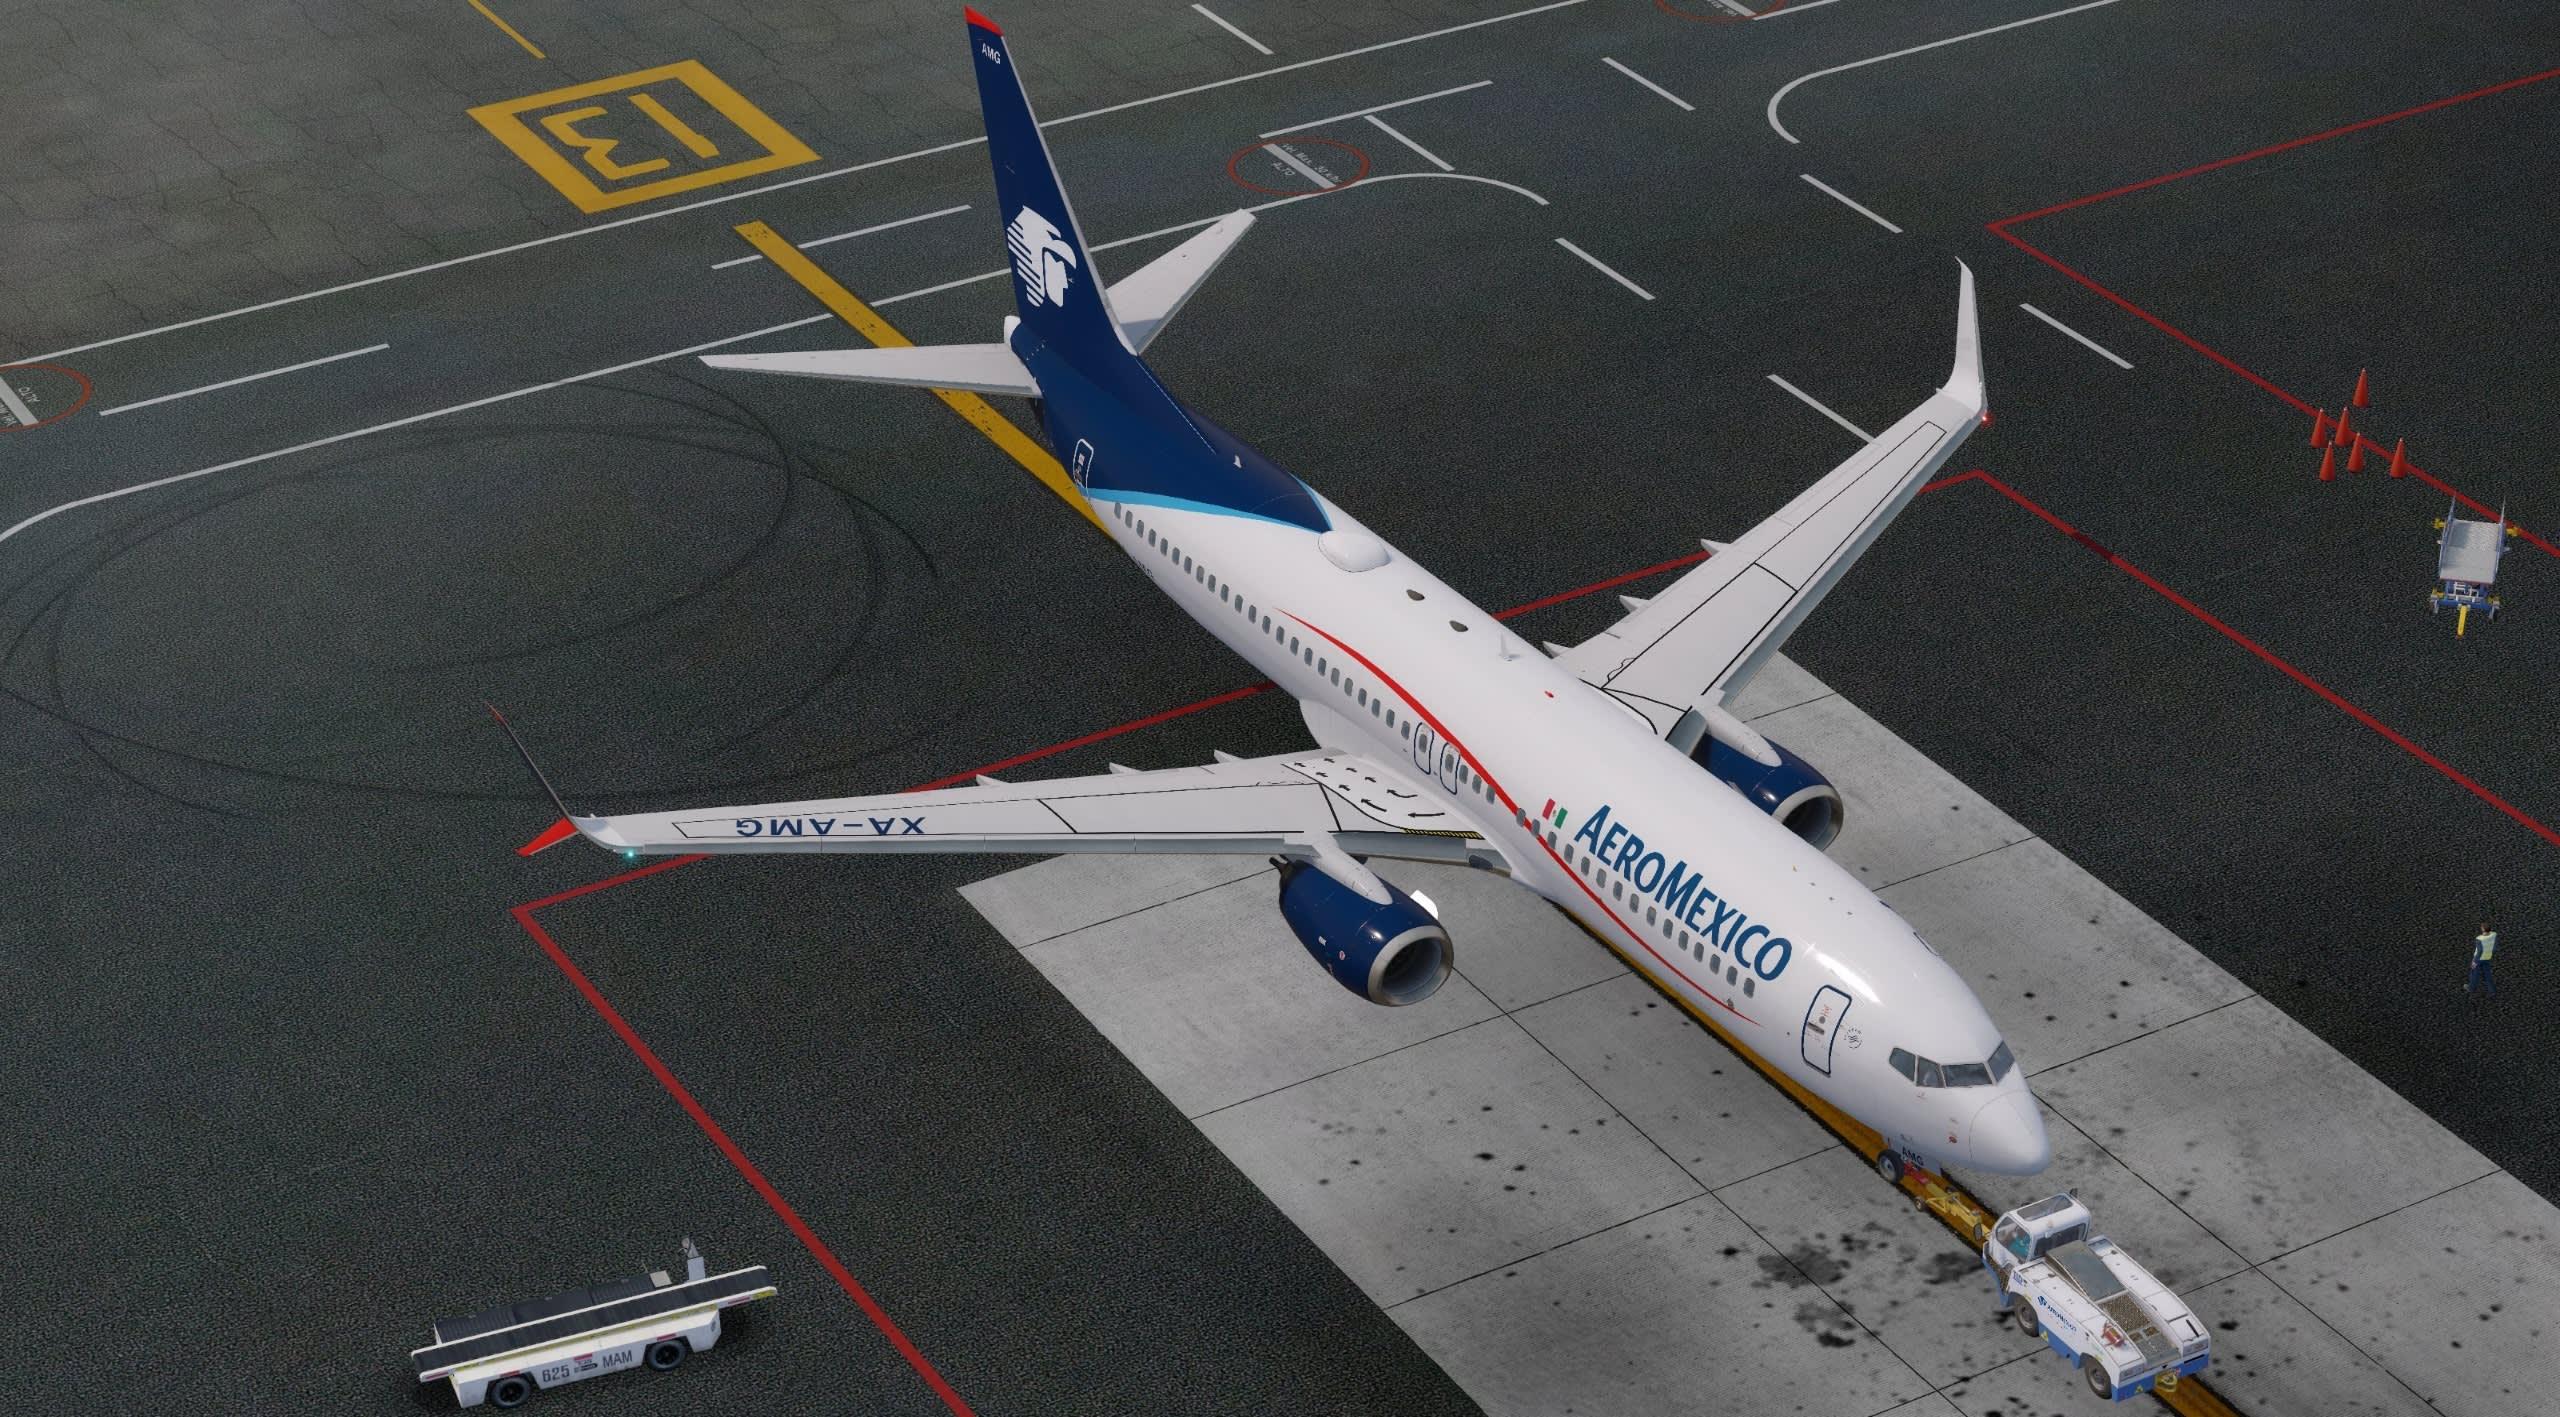 Aeromexico at MMMX for the Aeromexico tour